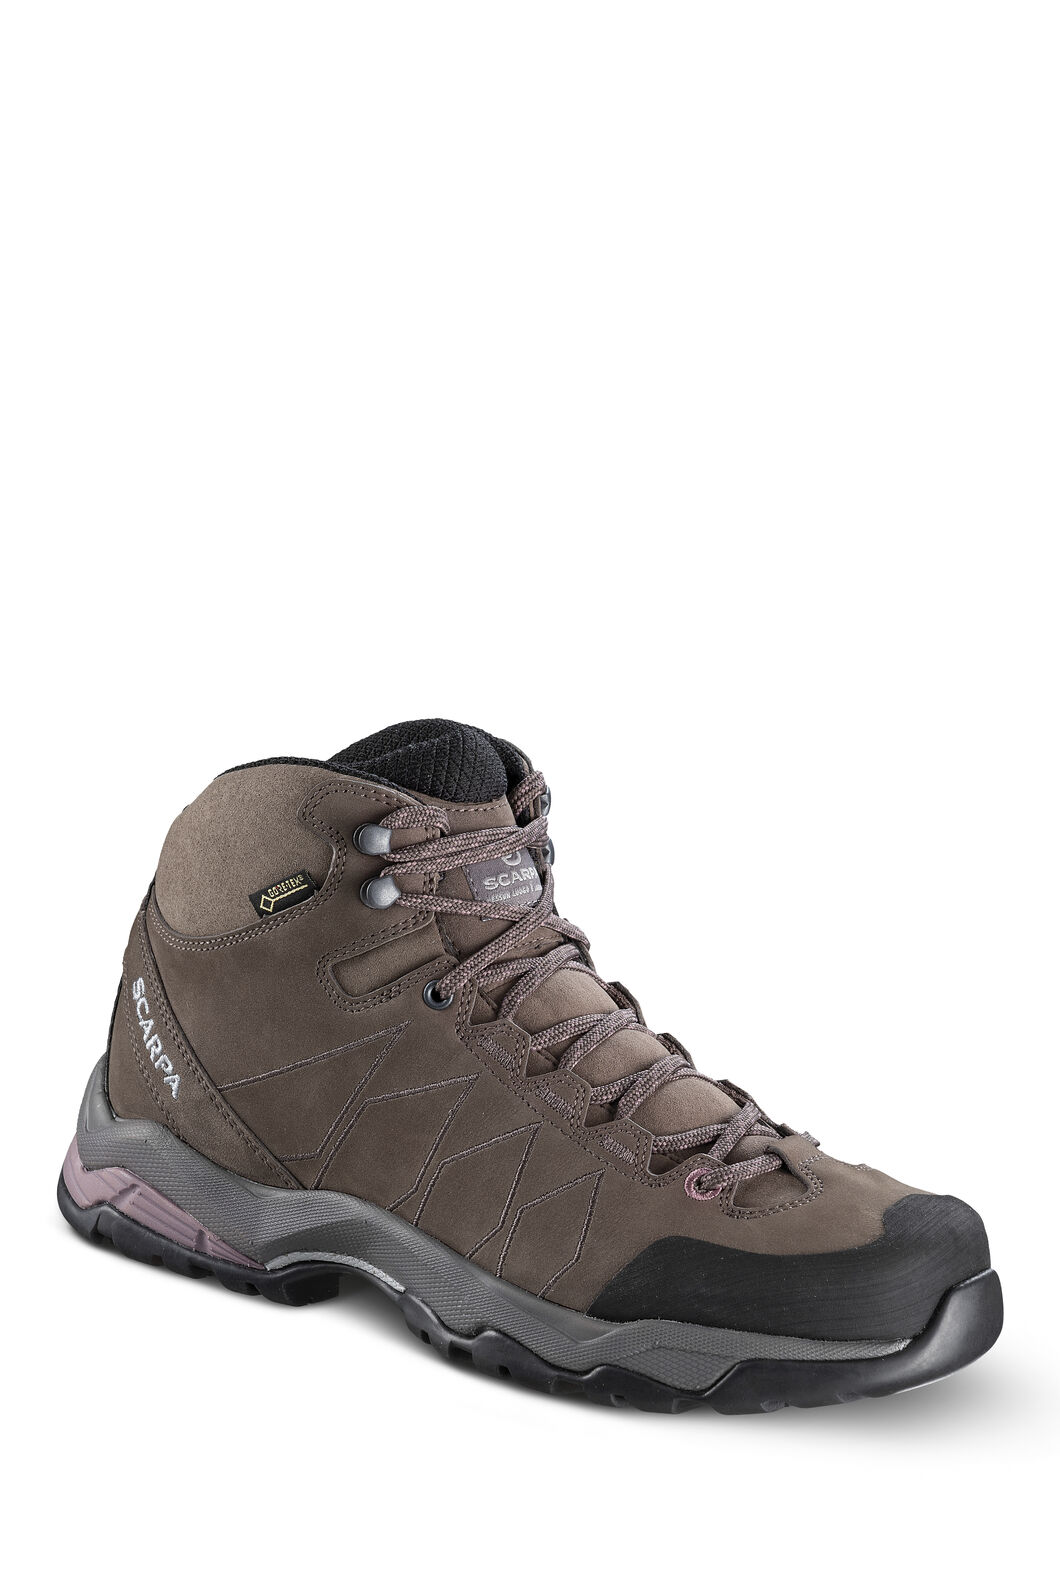 Scarpa Moraine Plus GTX Hiking Boot — Women's, Charcoal/Dark Plum, hi-res